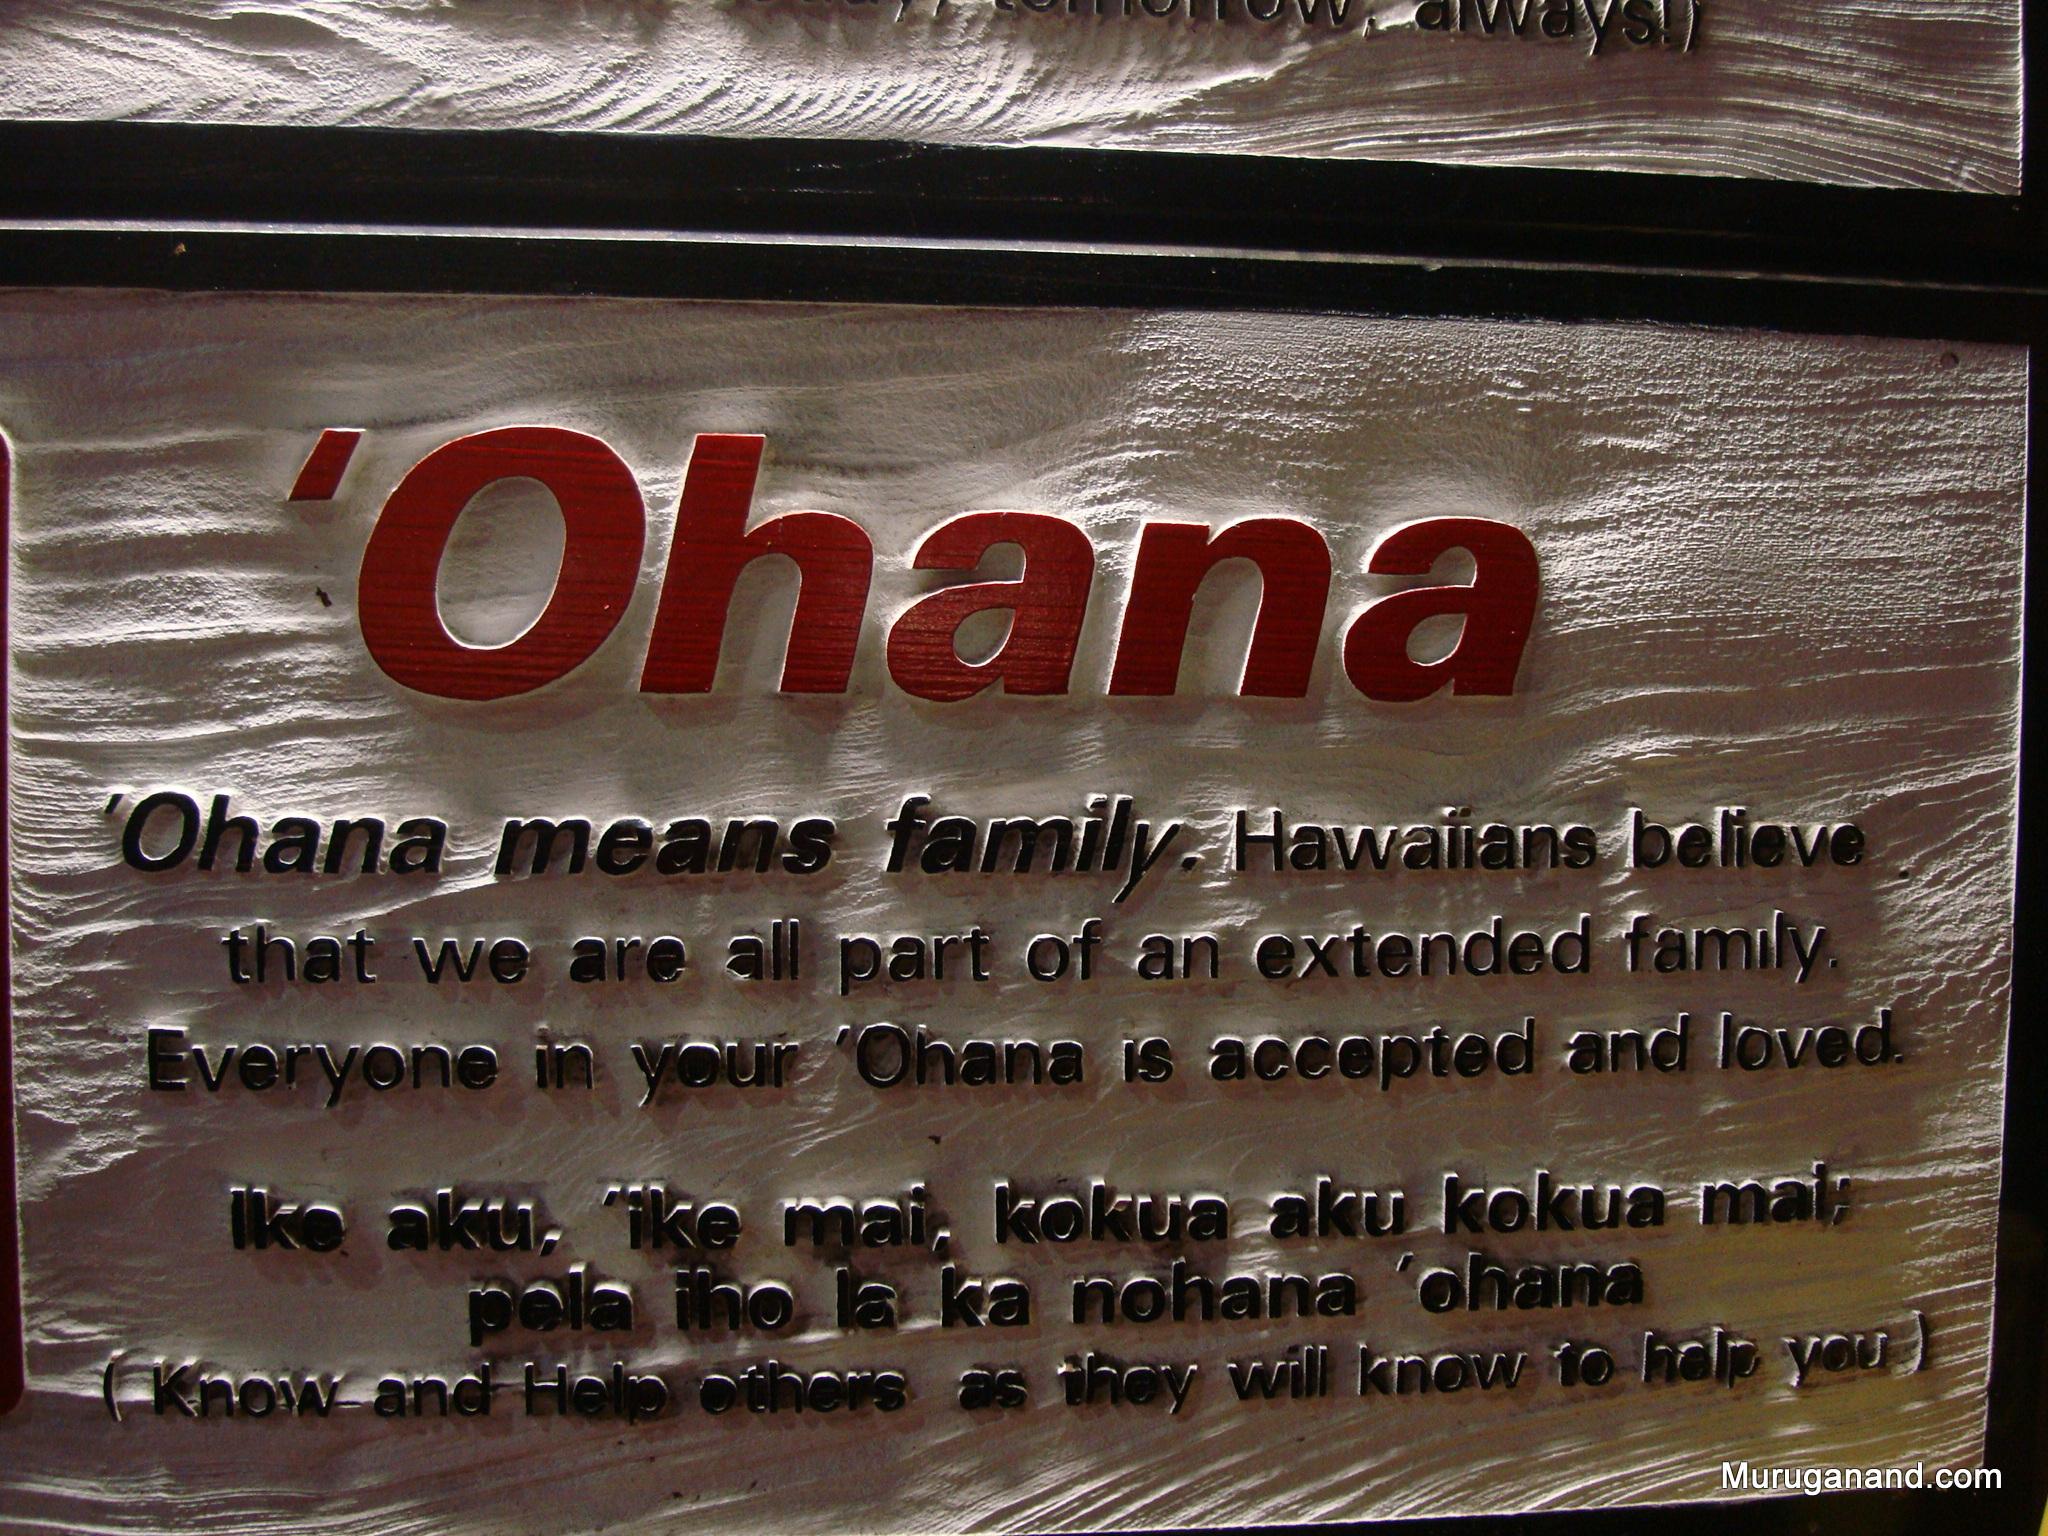 Ohana is Family